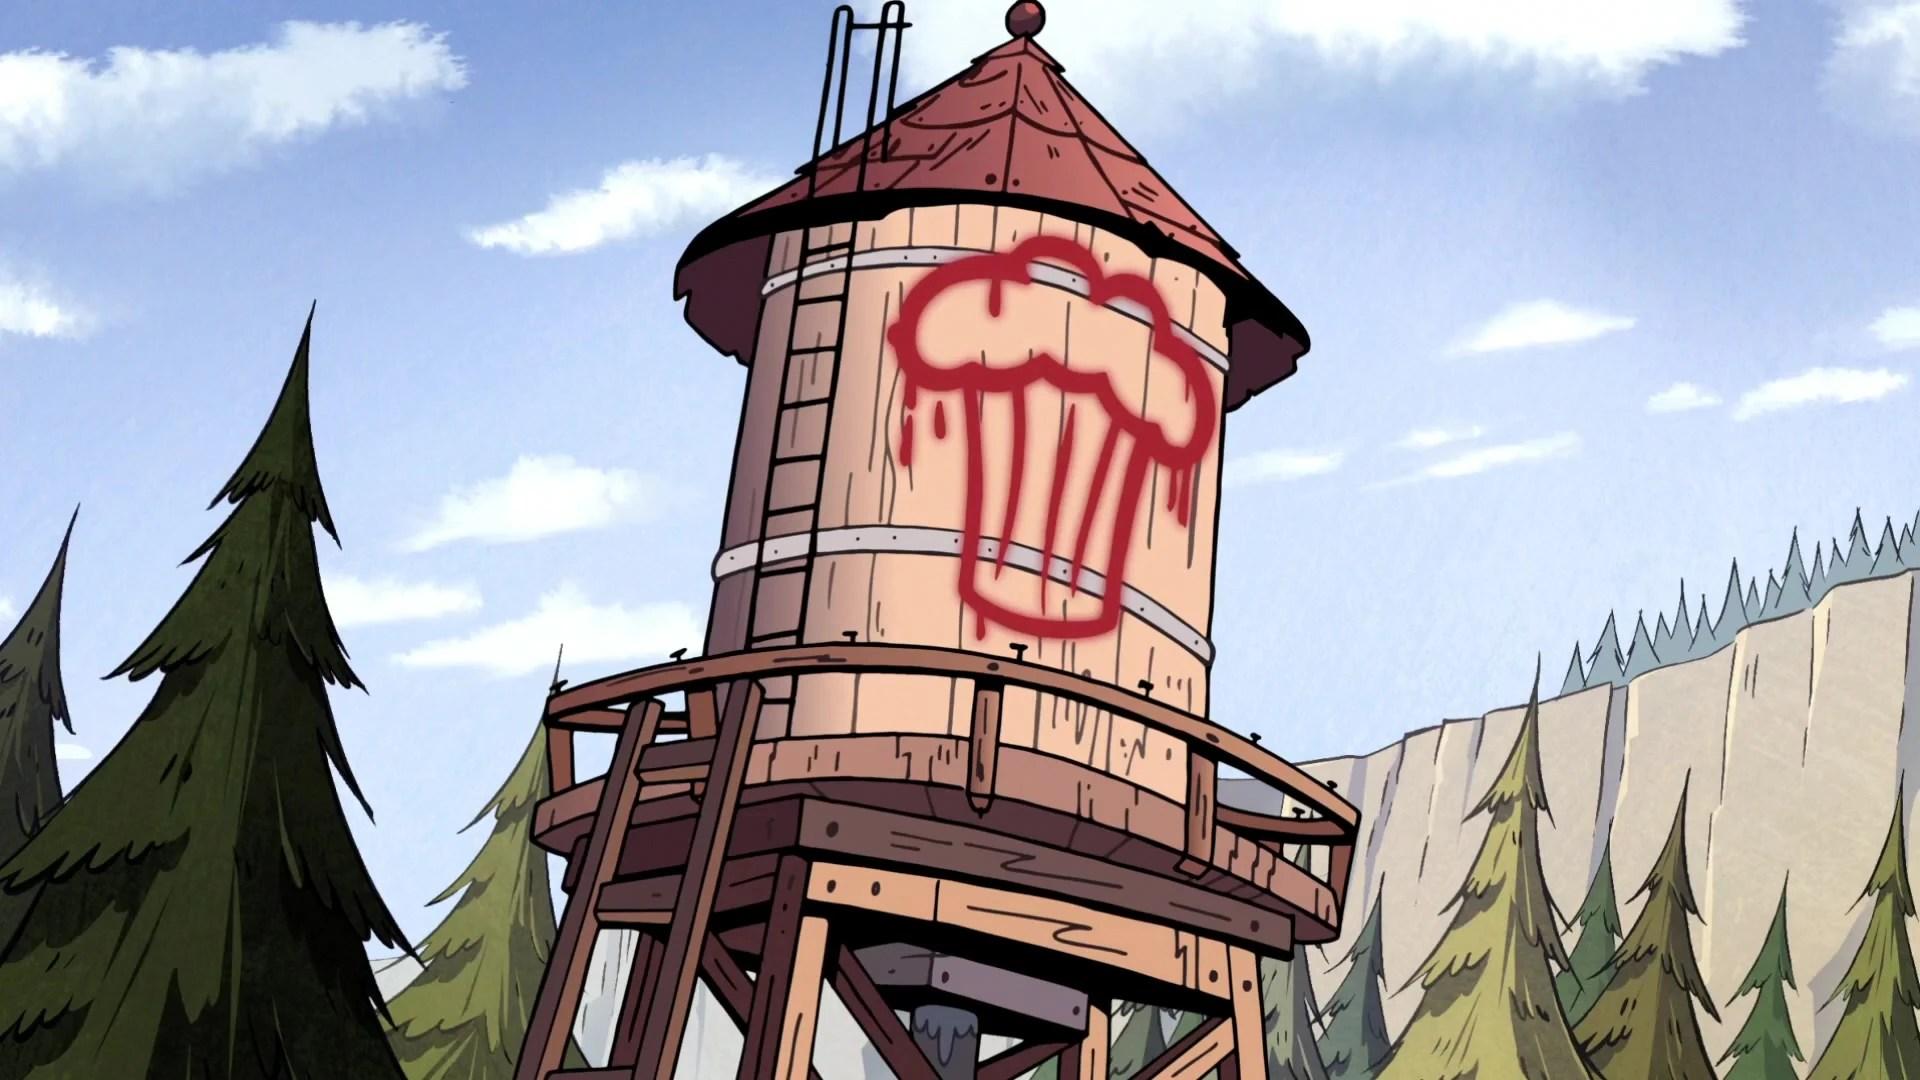 Gravity Falls Wallpaper Bill Explosion Muffin Gravity Falls Wiki Fandom Powered By